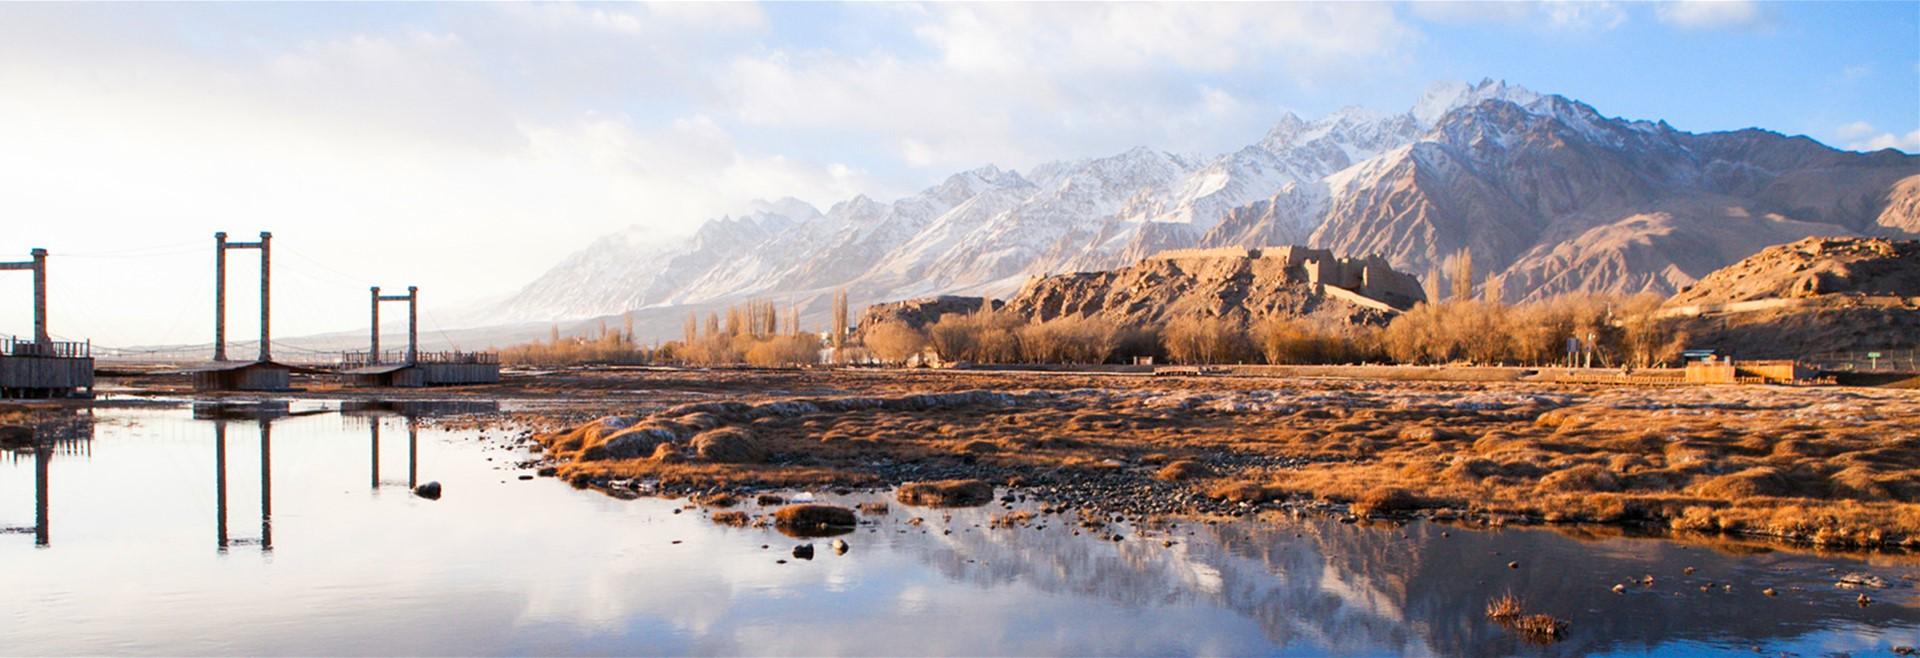 Luxury Silk Road Tours